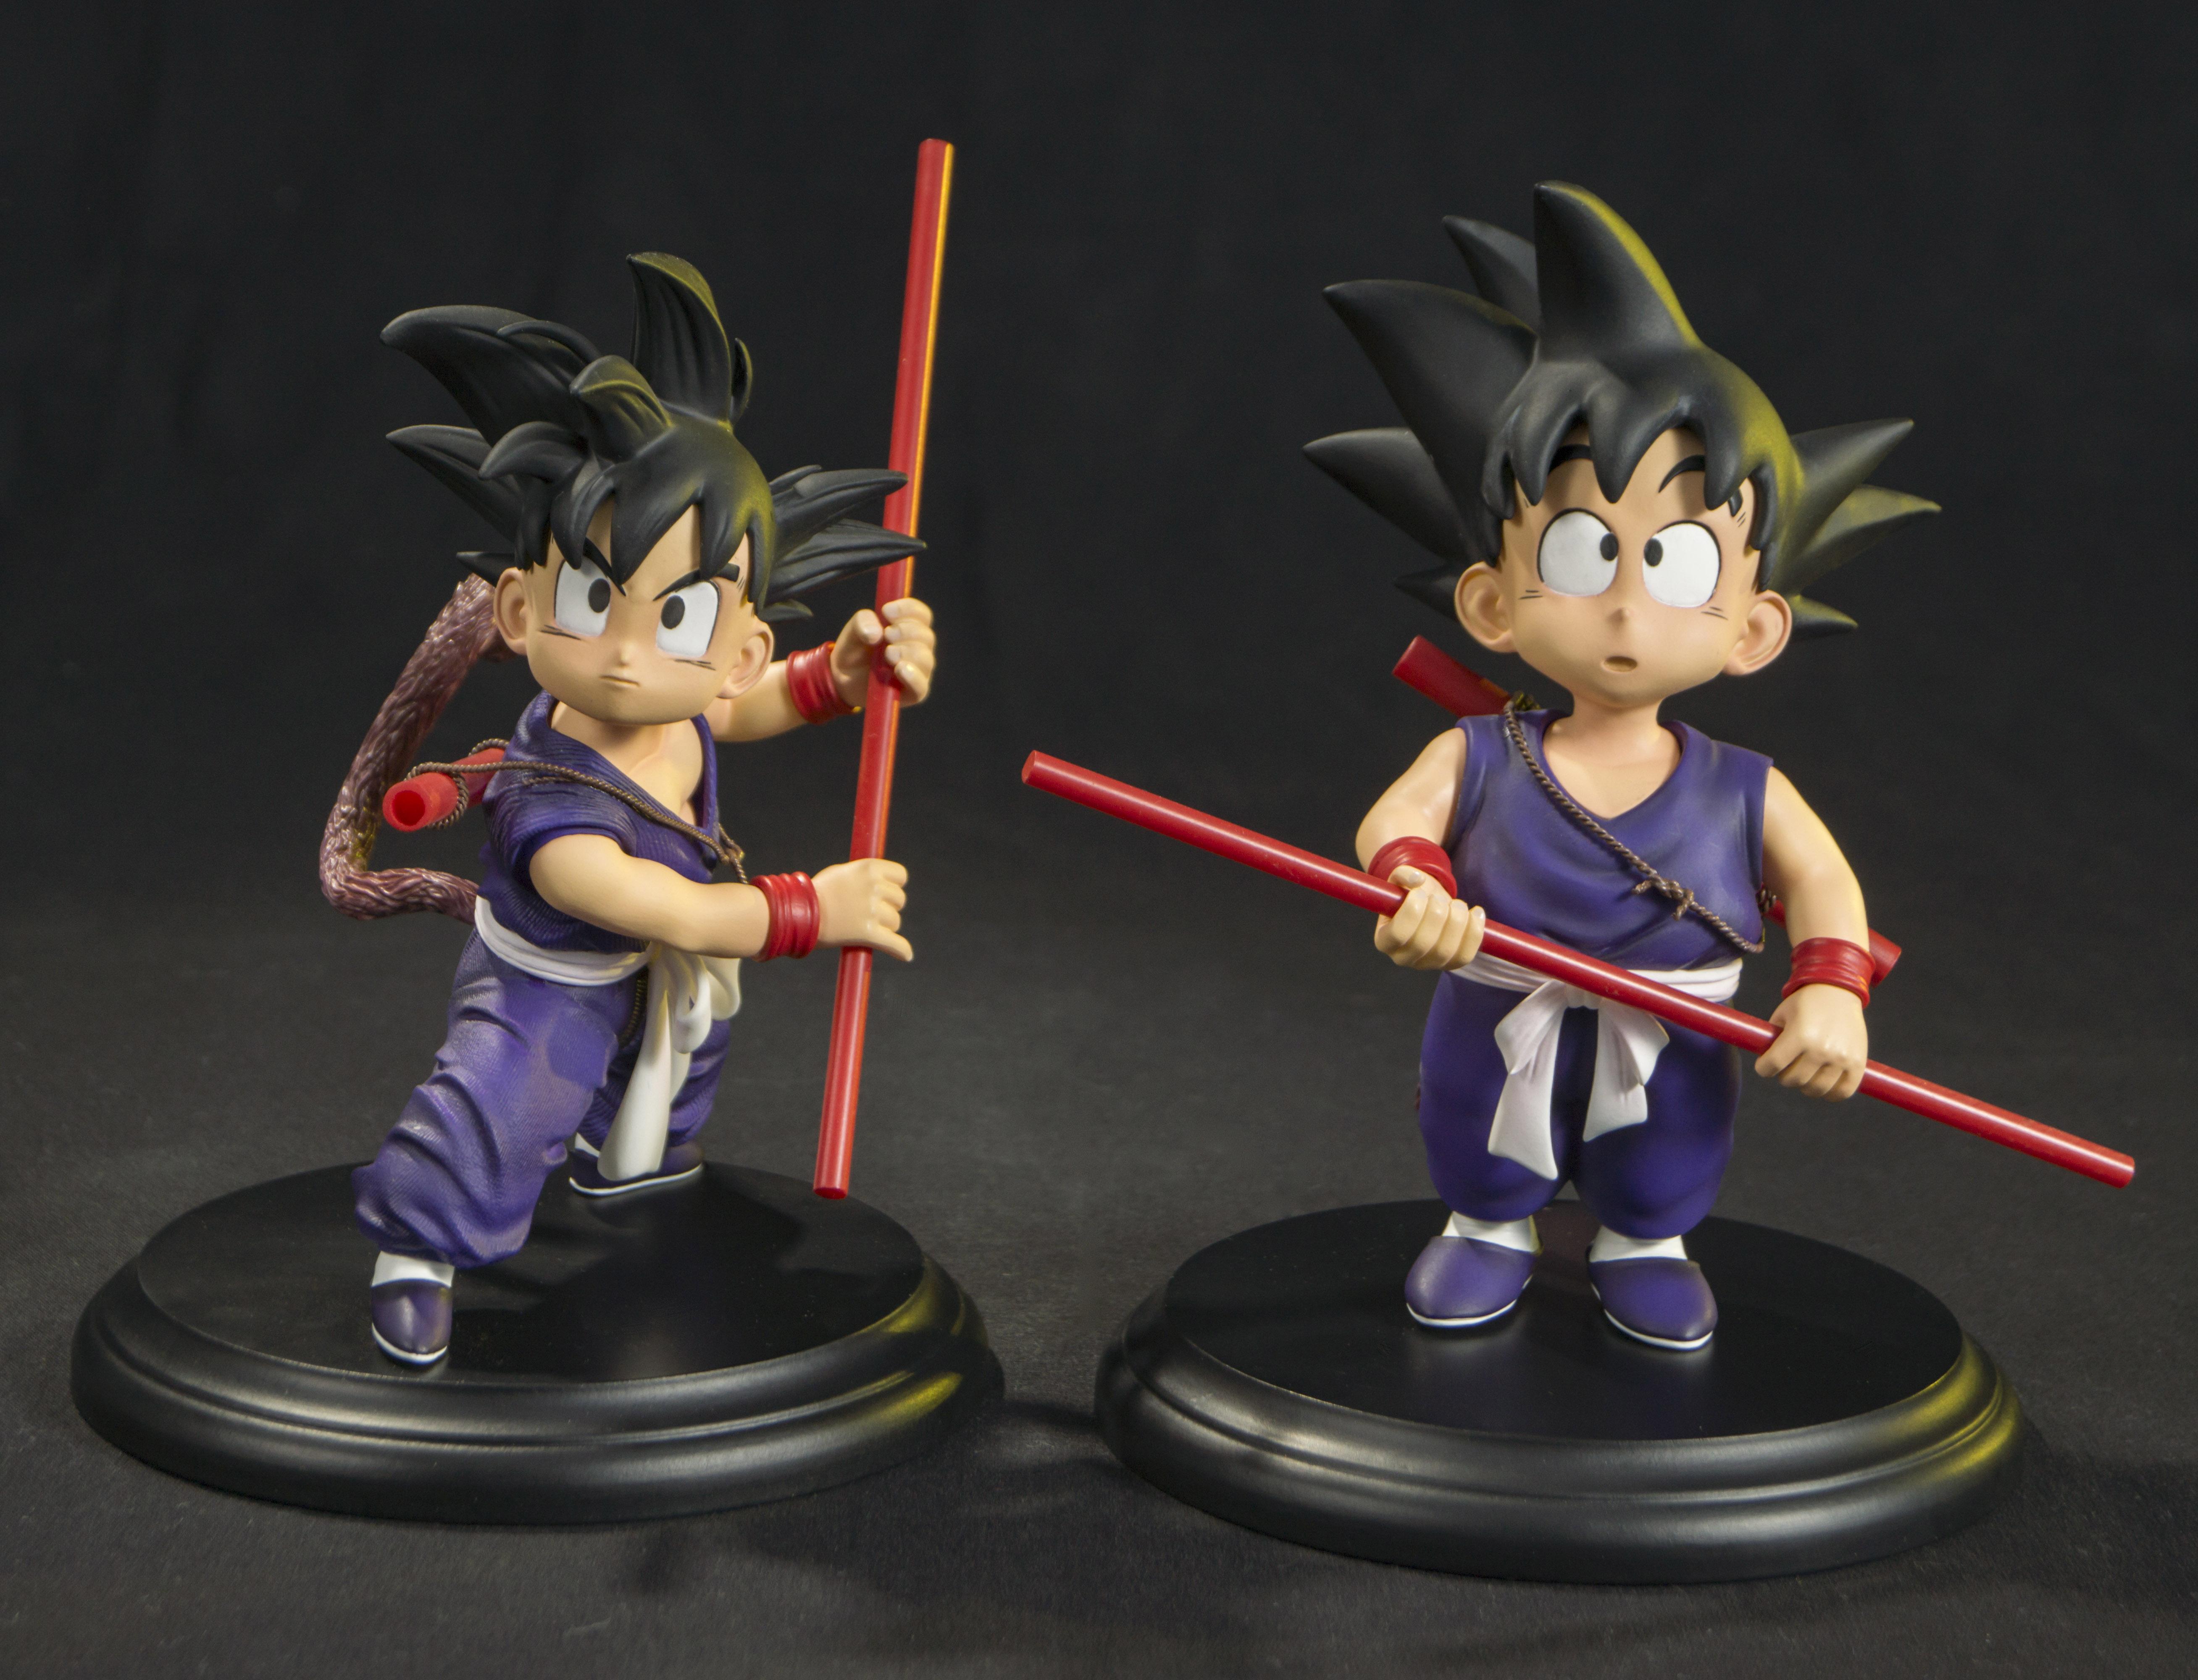 Wholesale Customized Dragon Ball Diorama Goku and Bulma Resin Sculpture For Decoration